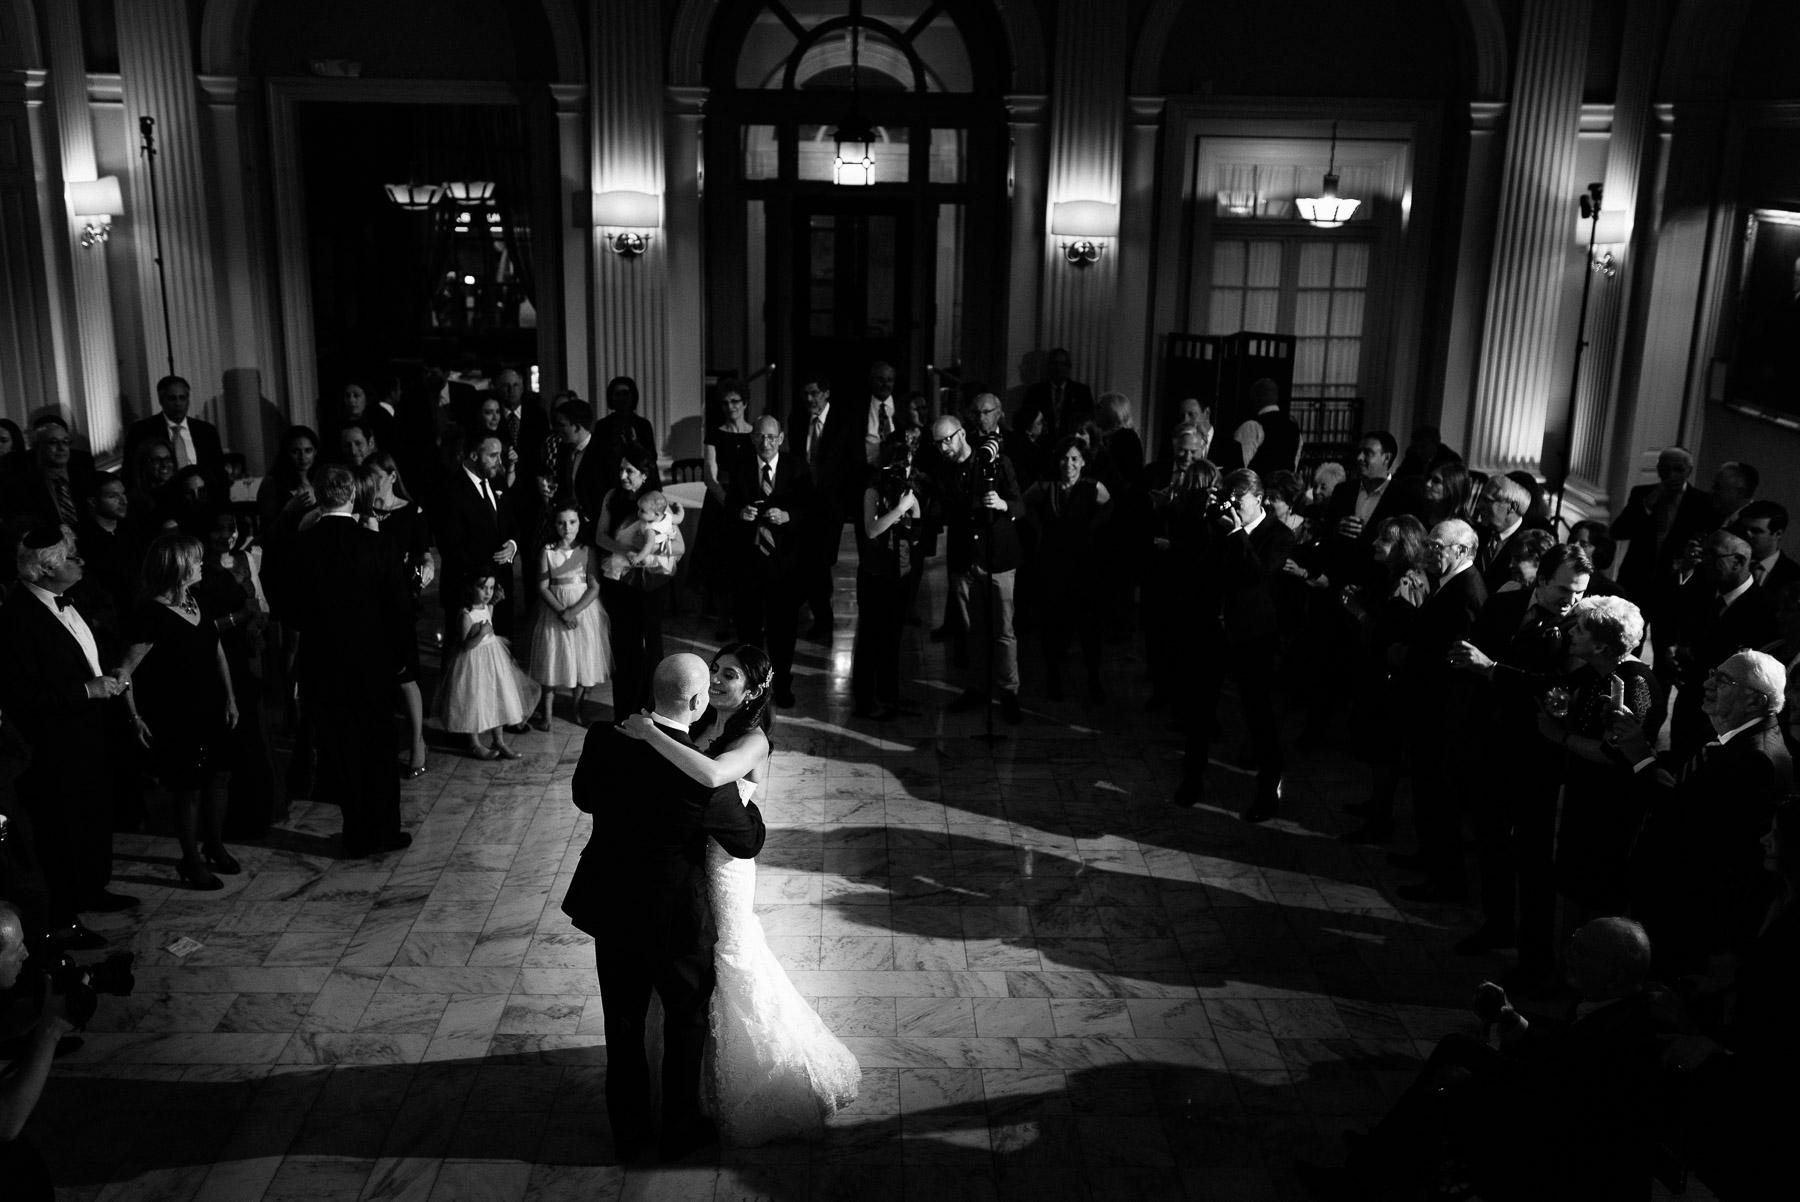 racquet-club-philadelphia-wedding-46.jpg